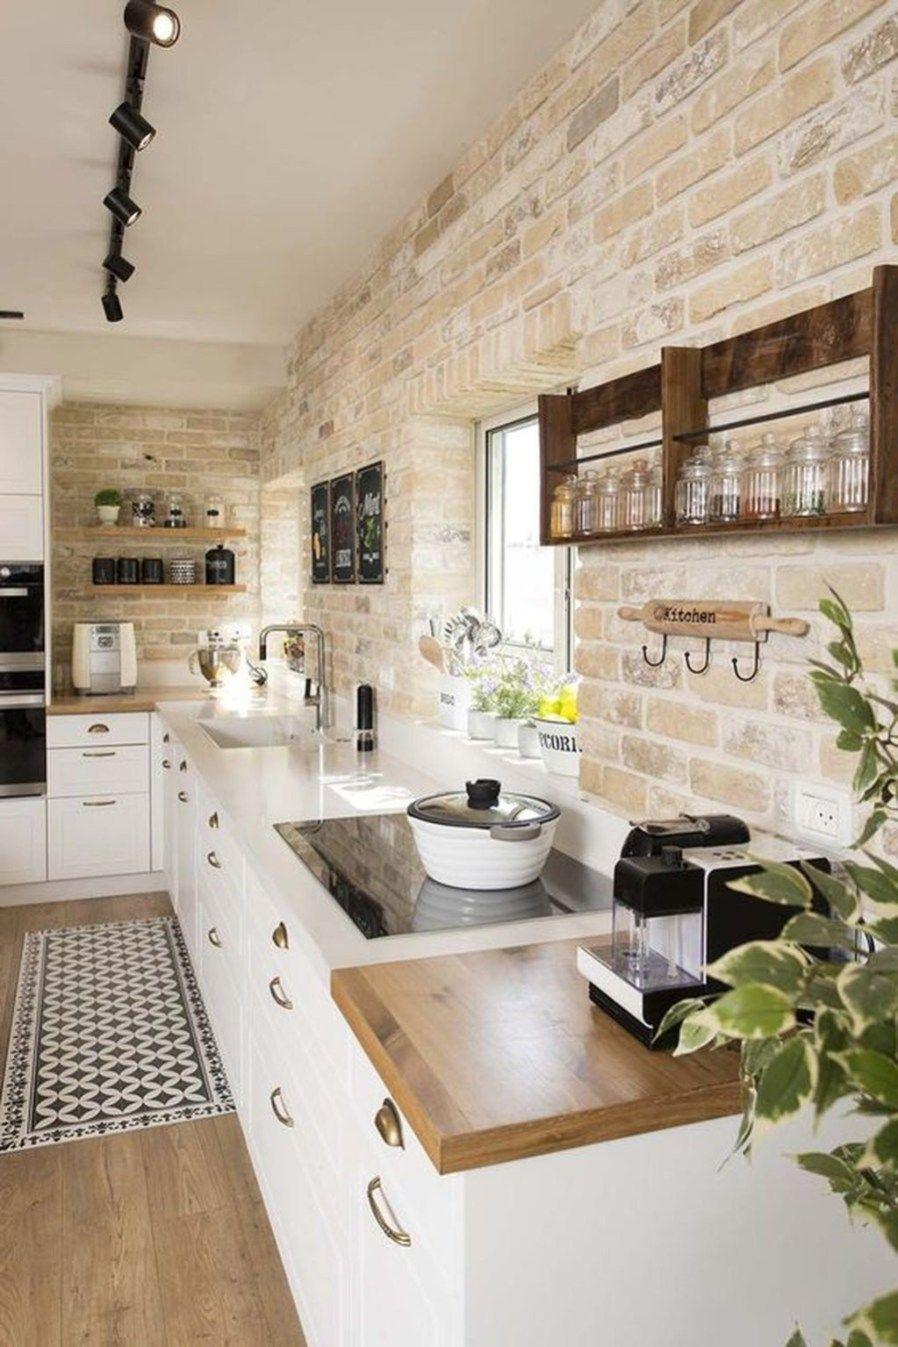 Perfect farmhouse kitchen decorating ideas for also dreamhome rh pinterest